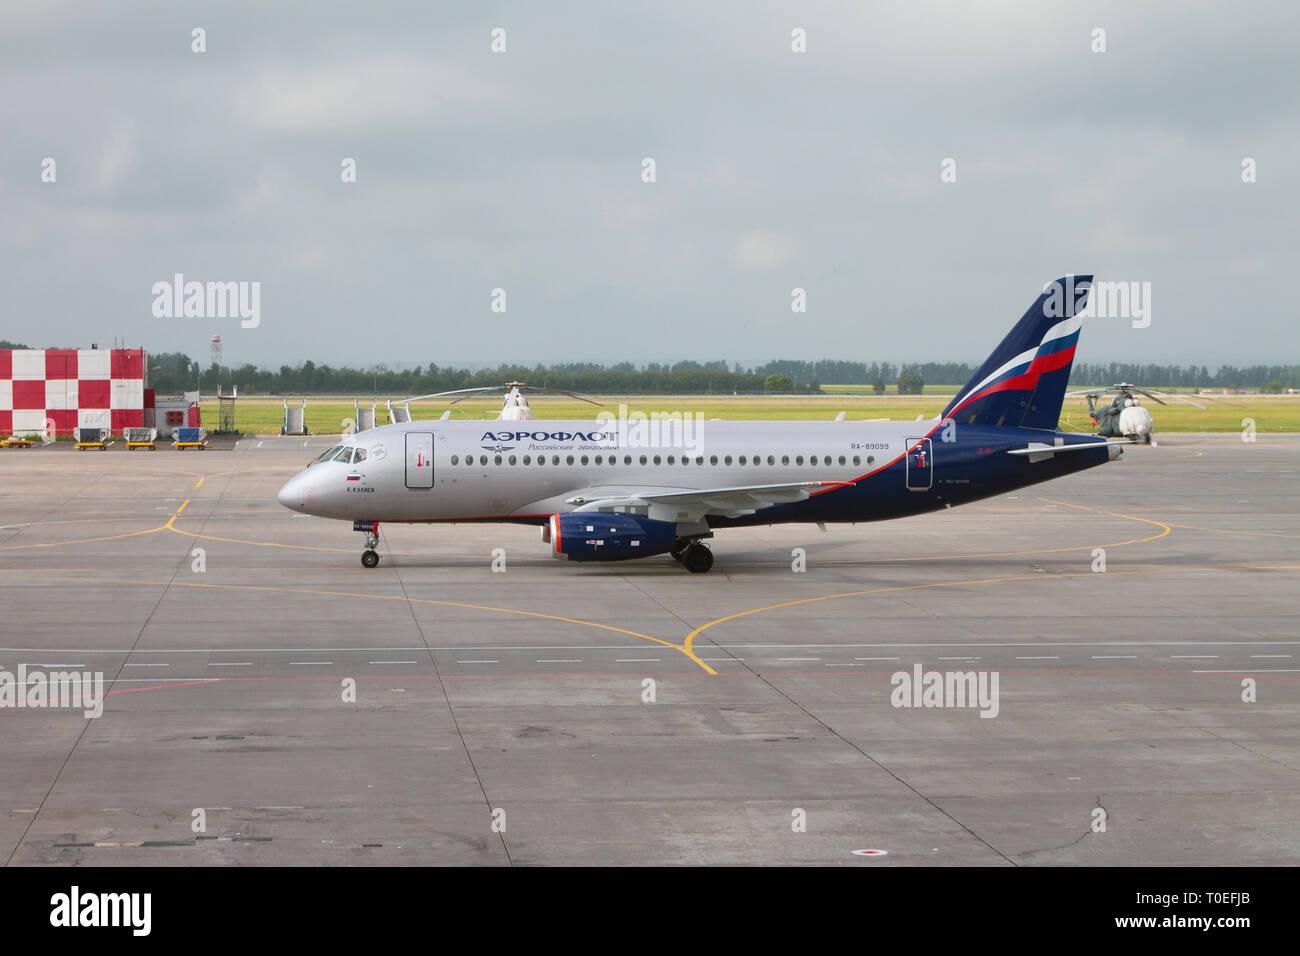 Kazan, Russia - Jul 19, 2018: Plane 'K. Kuliev' on taxiing at airport - Stock Image